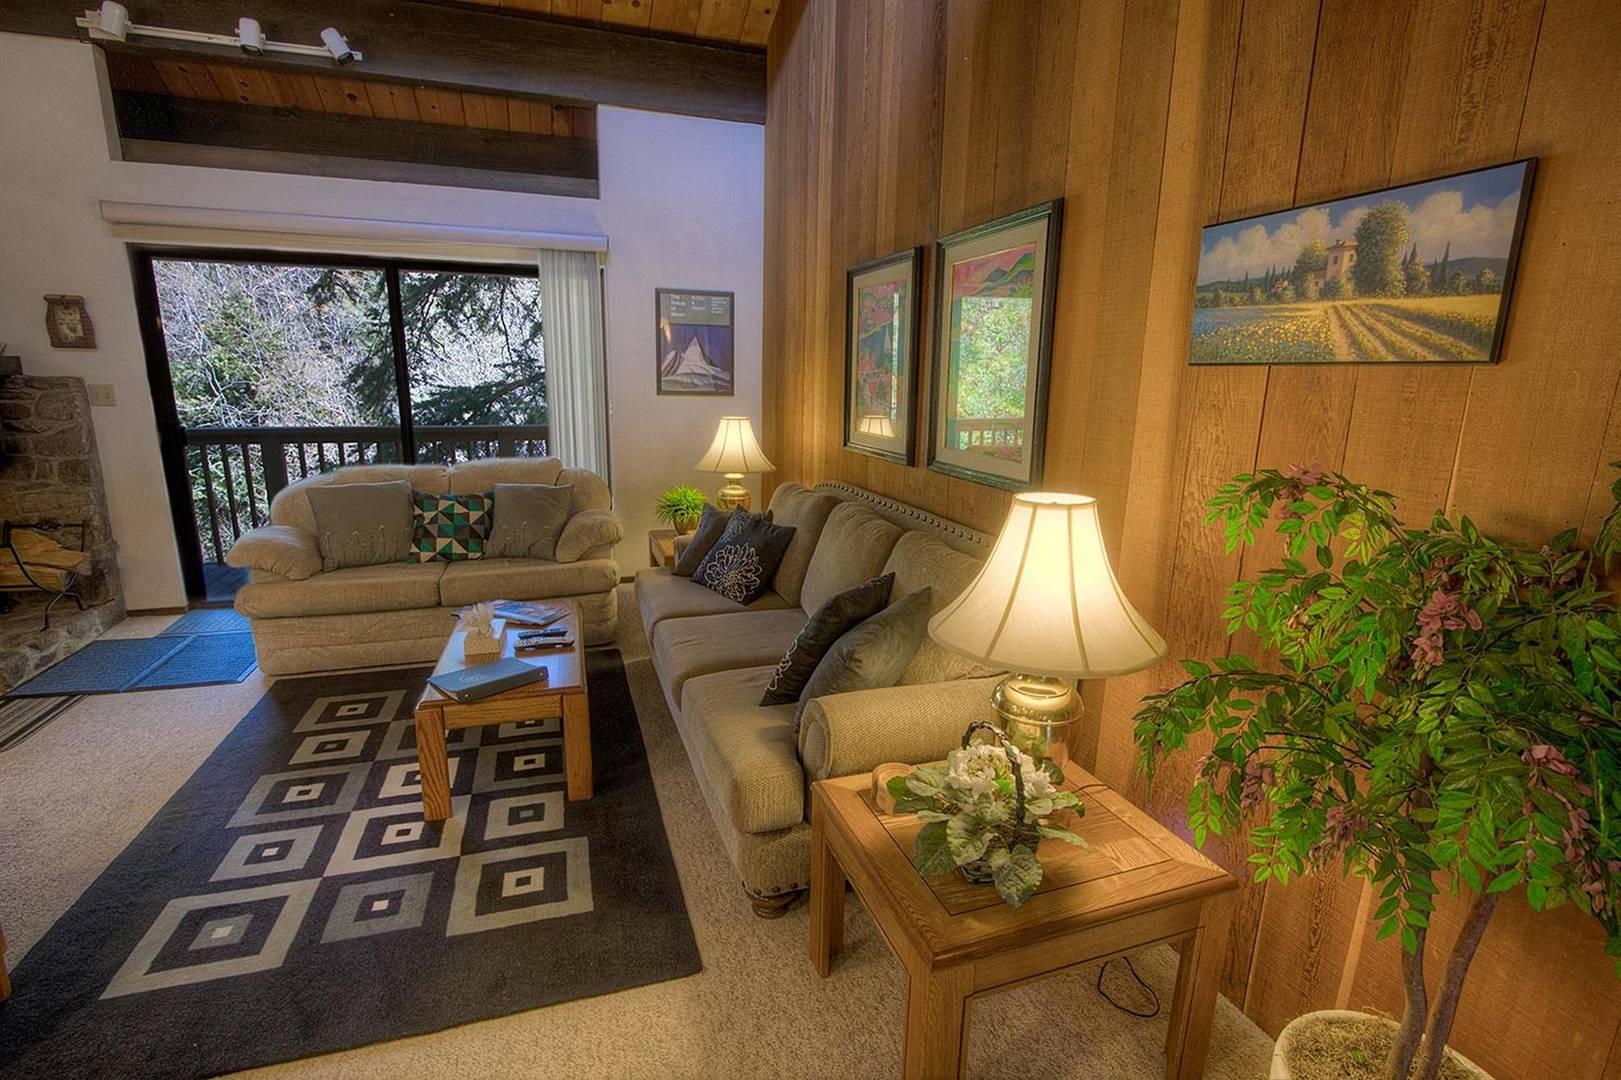 KWC0655 Living Room